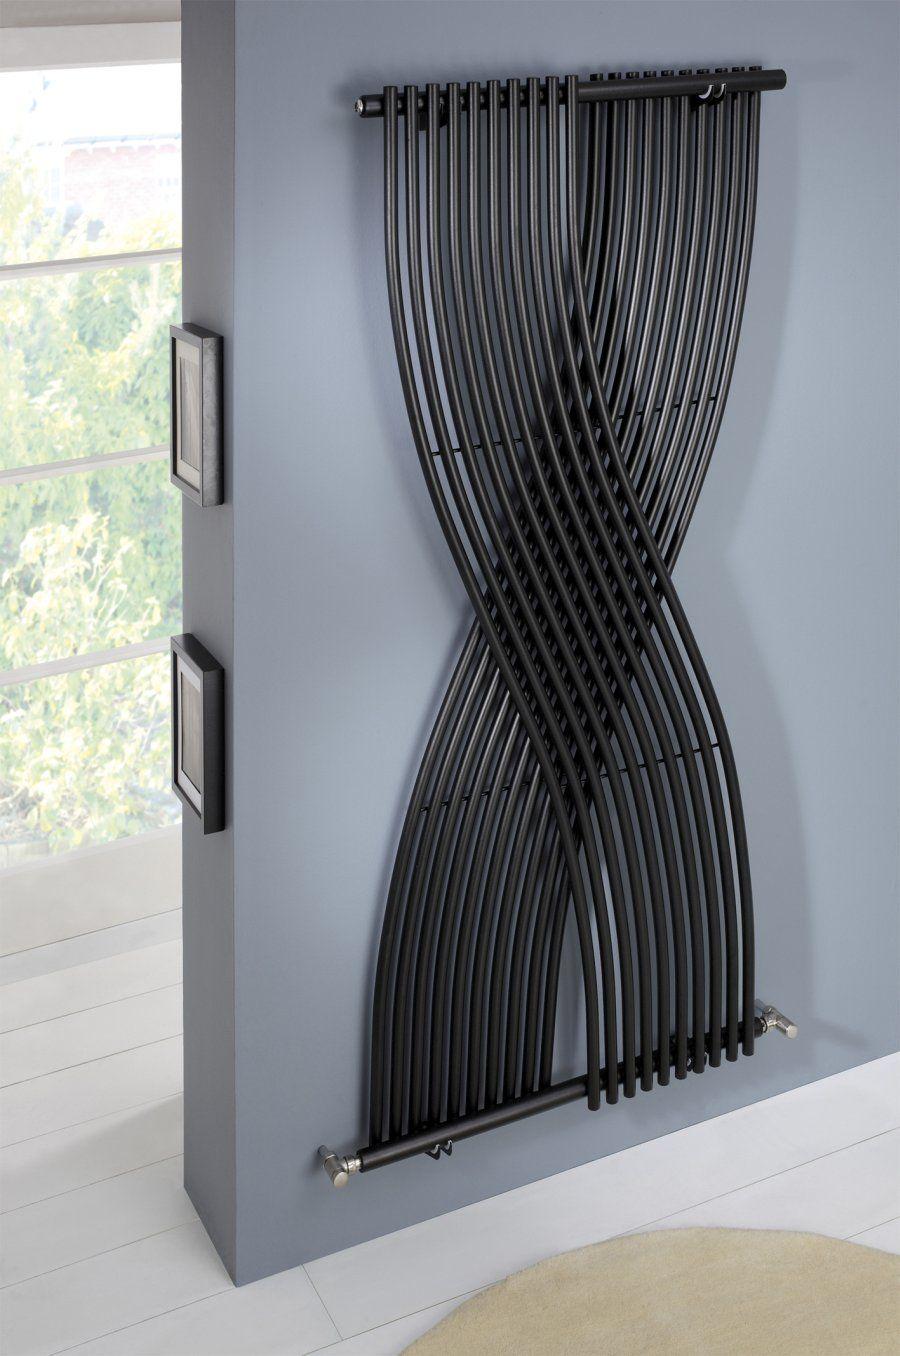 mhs gemini wall mounted radiator in matt black  radiators